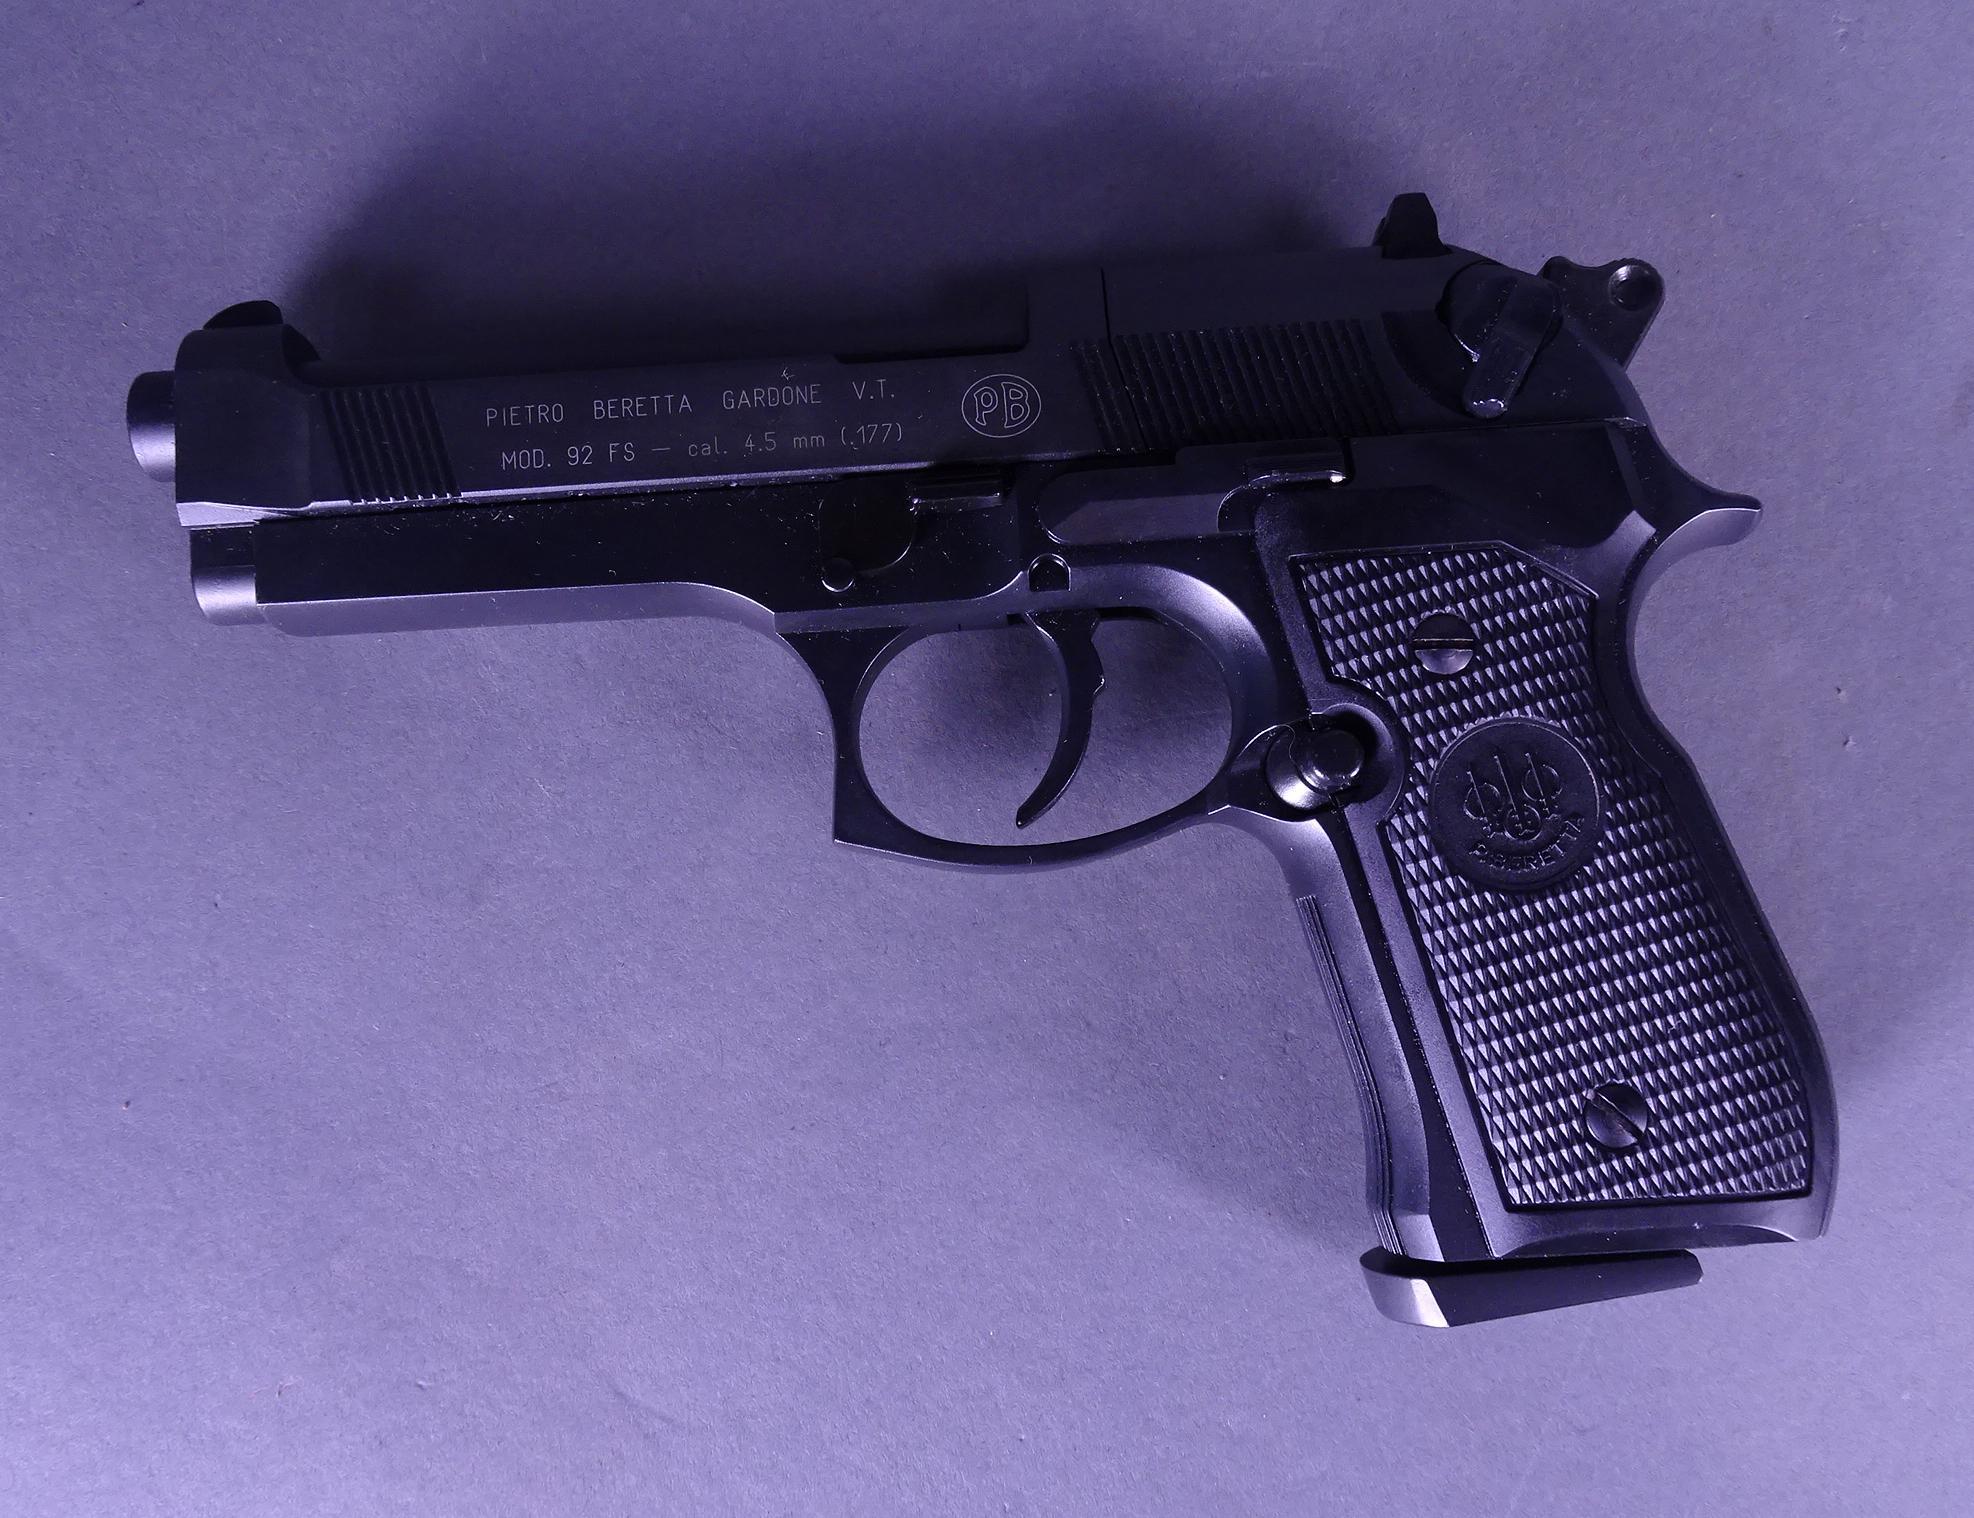 arme pistolet plomb air comprim pietro beretta cal 4 5mm. Black Bedroom Furniture Sets. Home Design Ideas